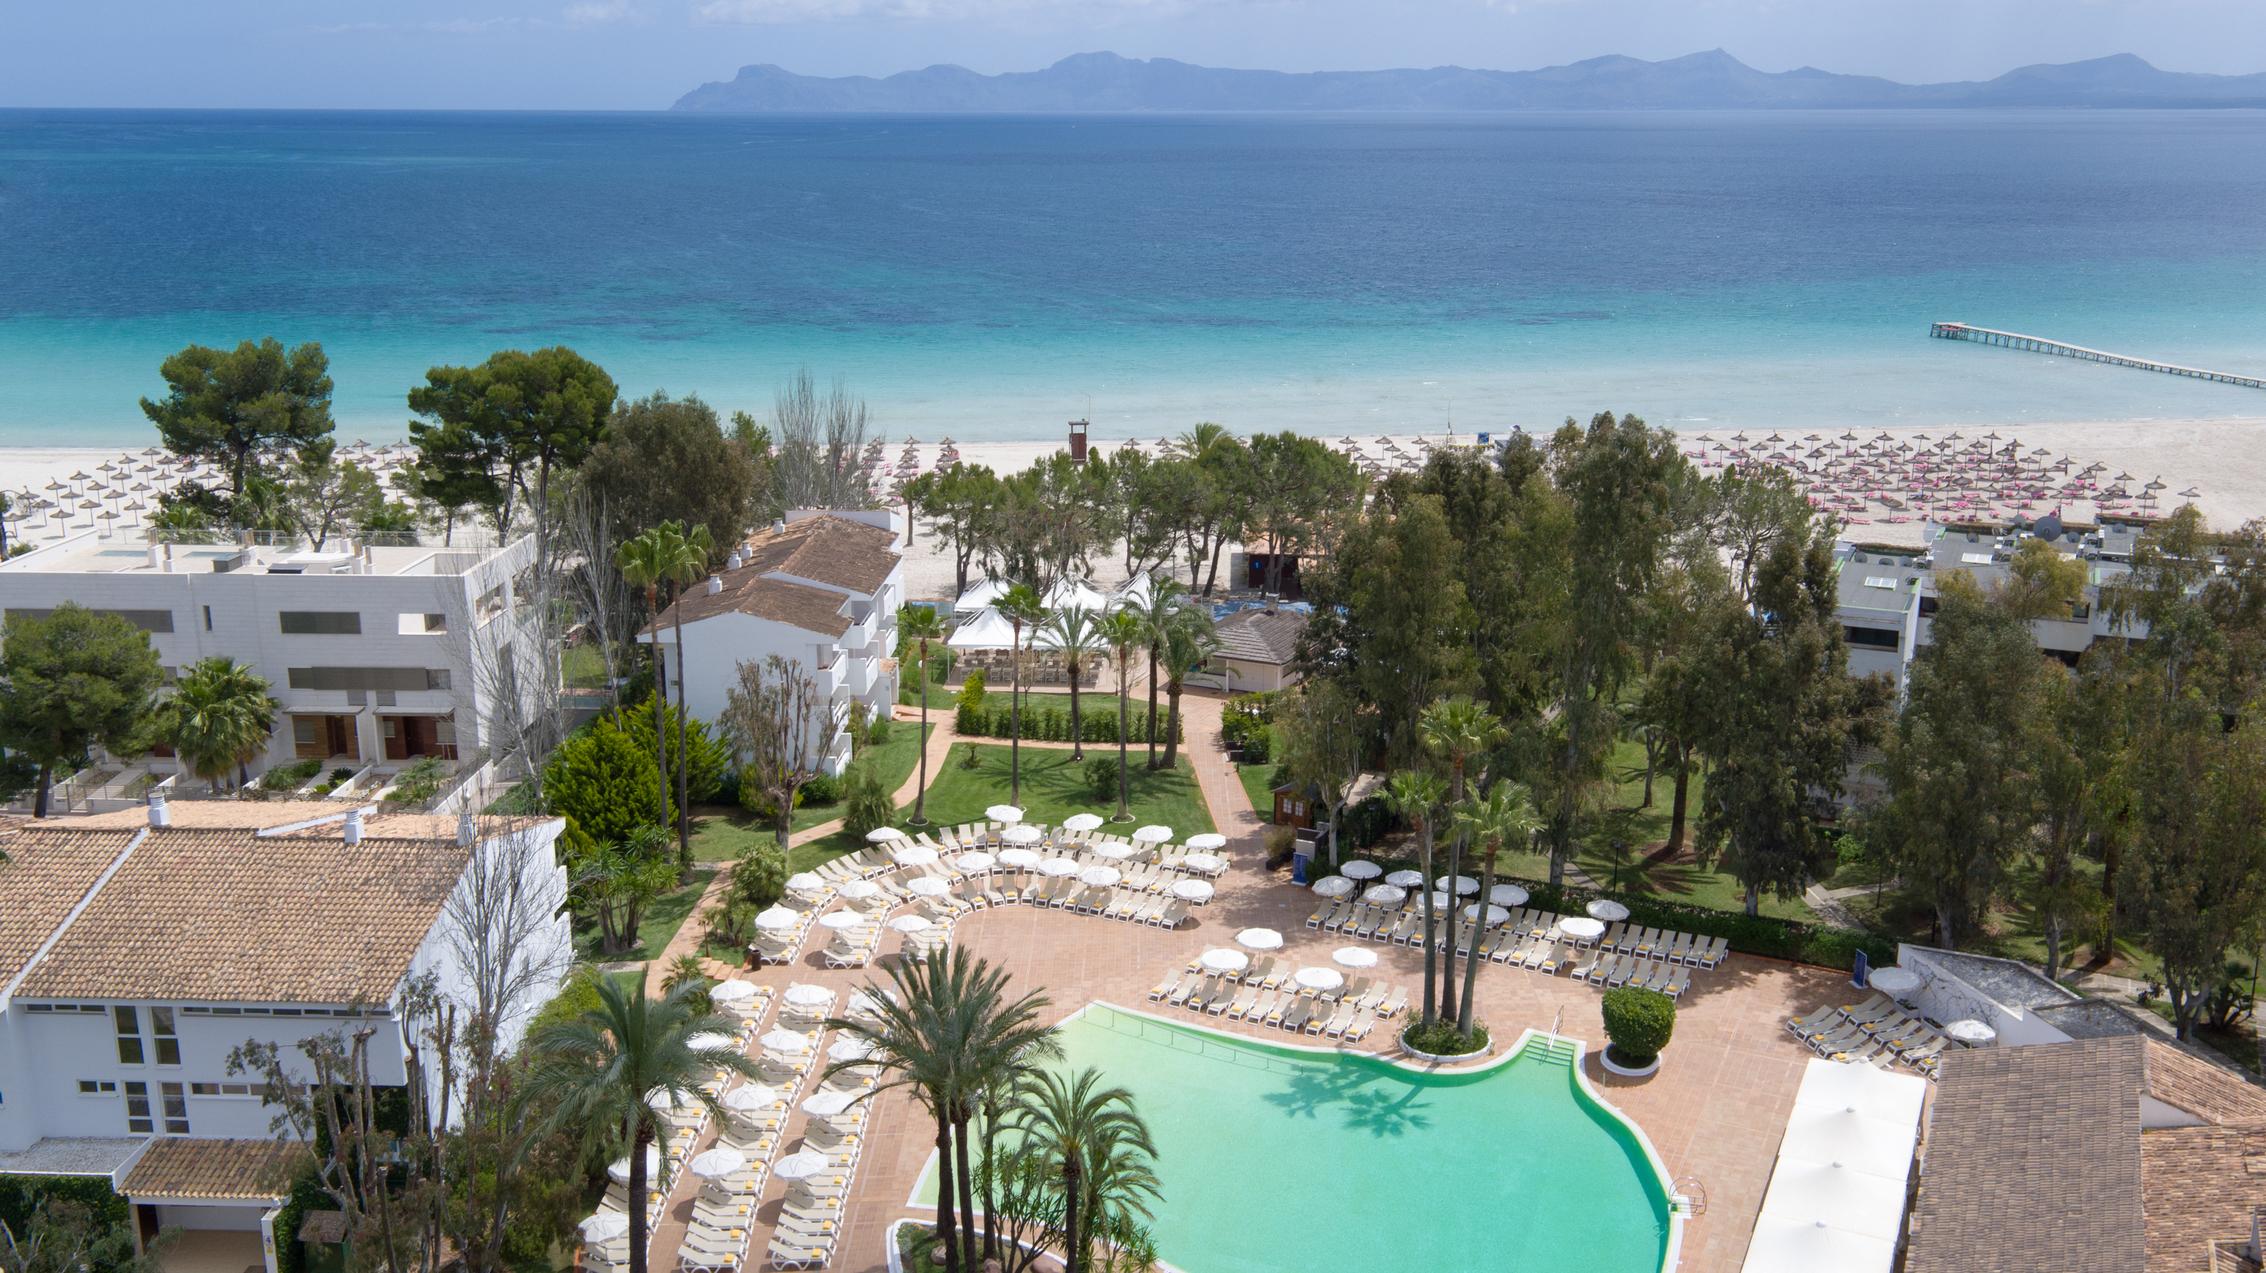 Hotel Iberostar Ciudad Blanca Alcudia Mallorca